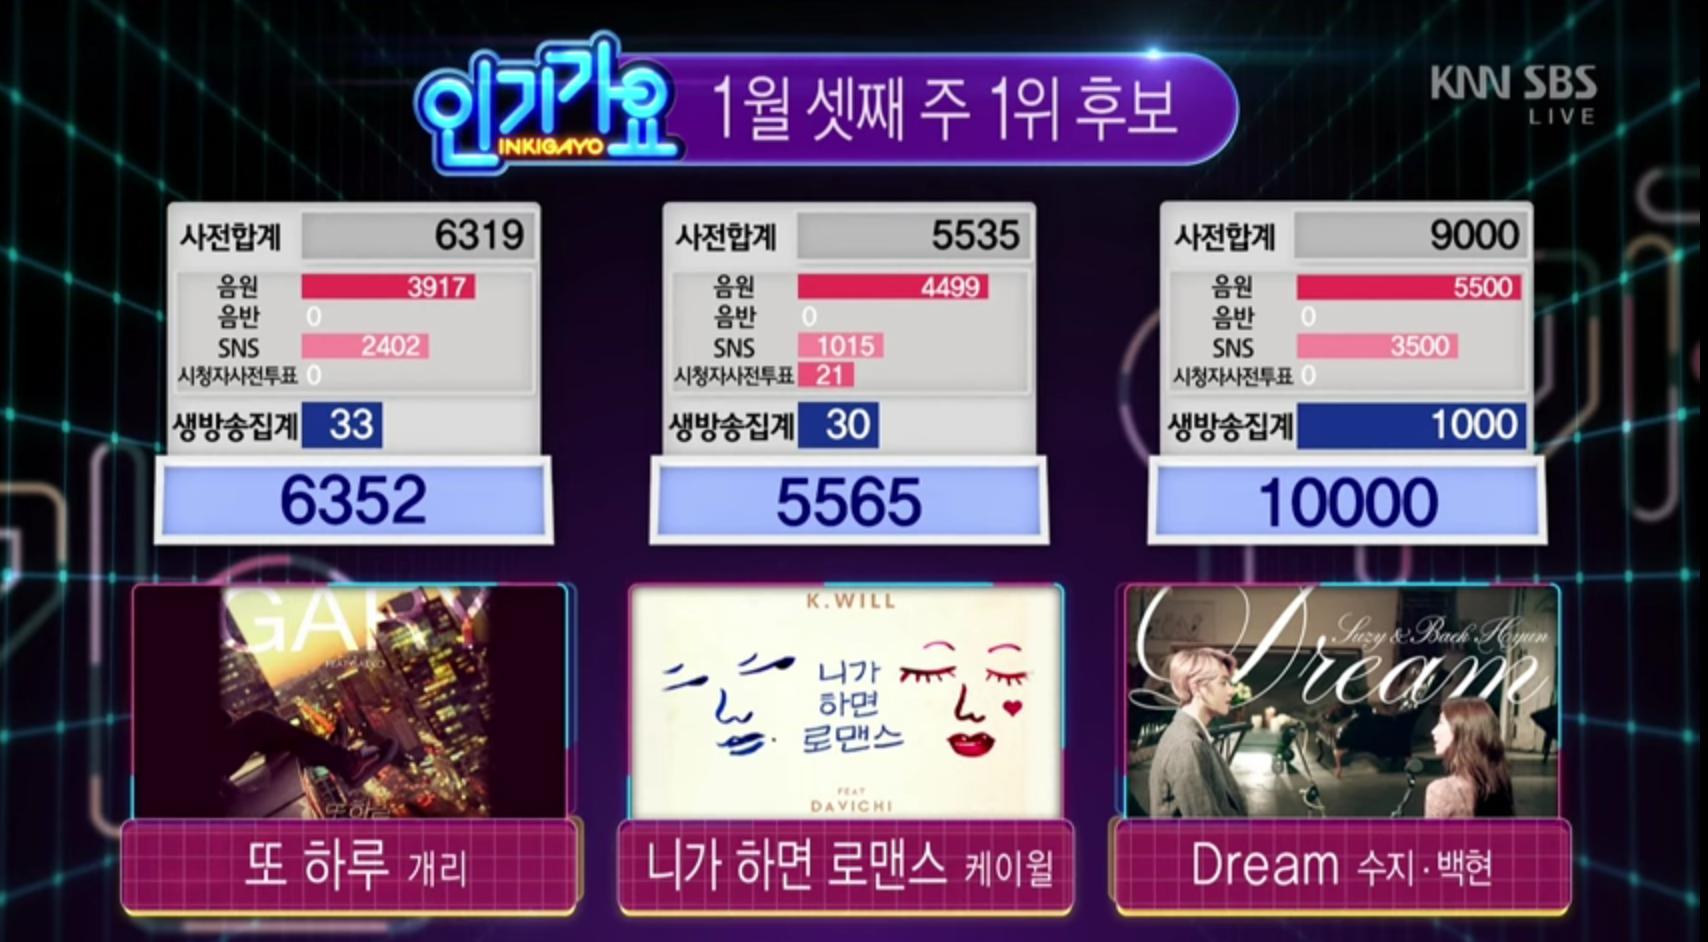 inkigayo suzy baekhyun dream win